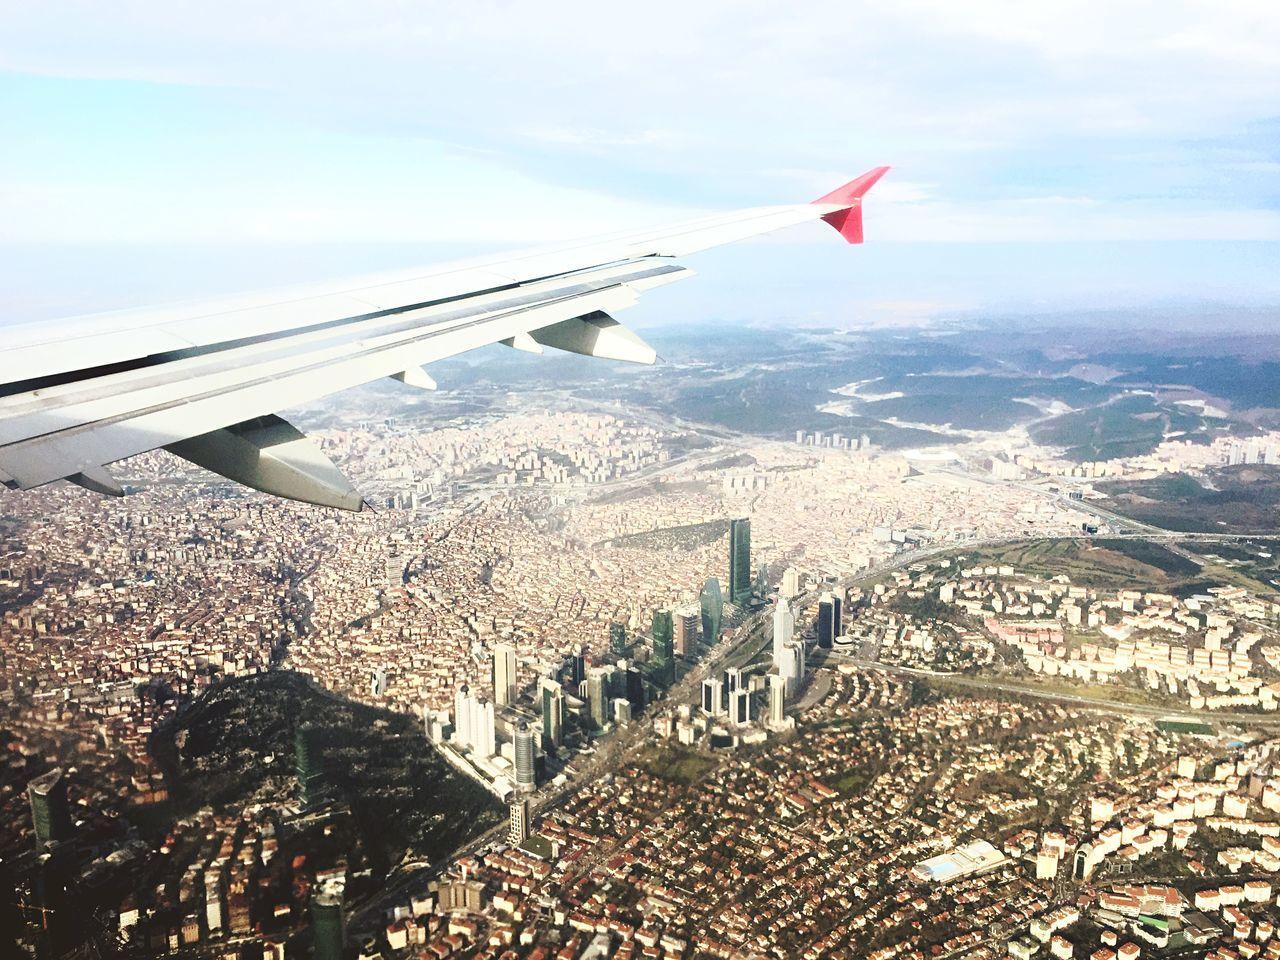 Beautiful stock photos of plane, Aircraft Wing, Airplane, Building Exterior, City